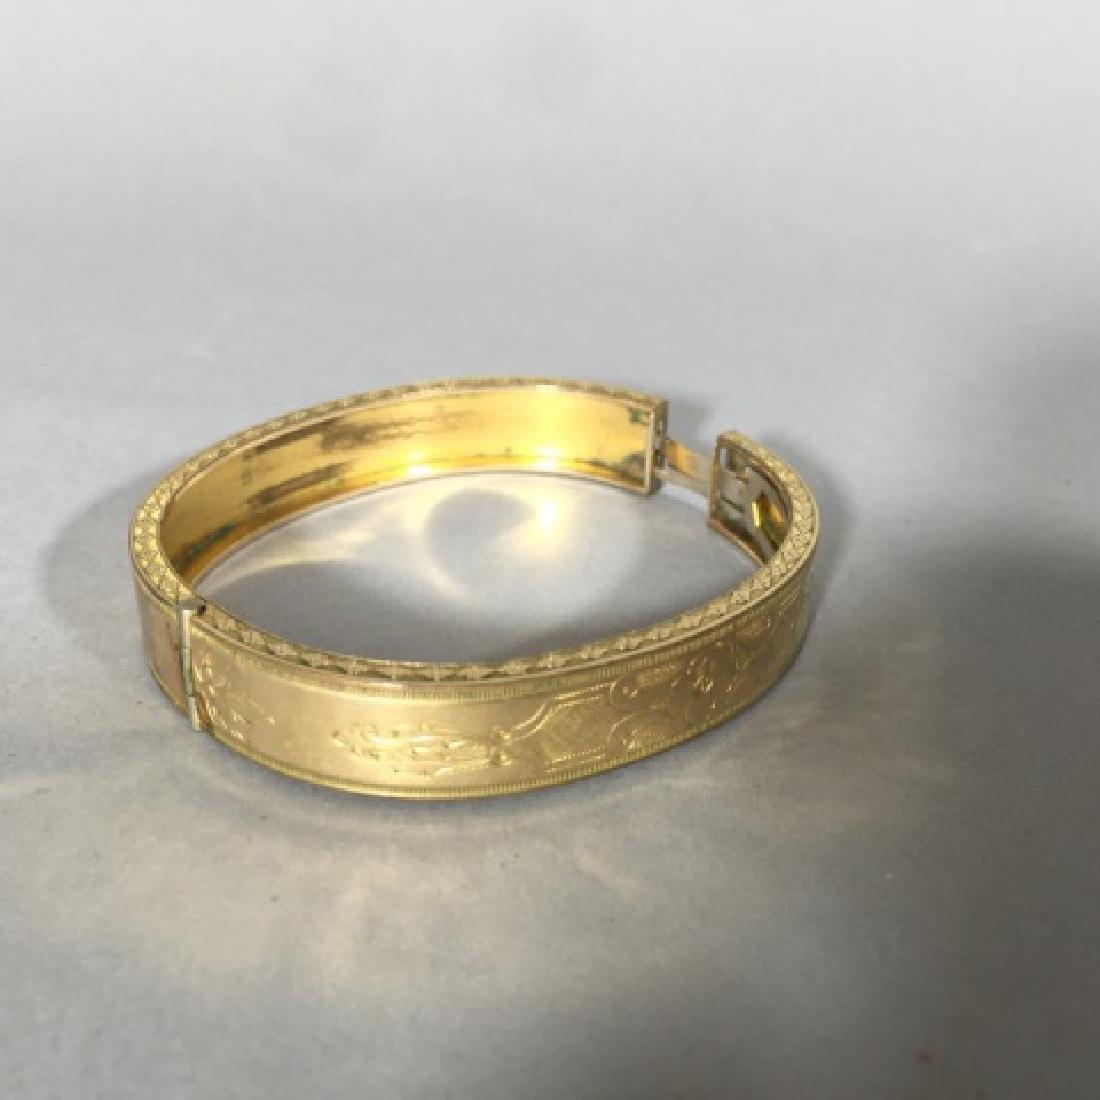 Antique 19th C Victorian Gold Bangle Bracelet - 3